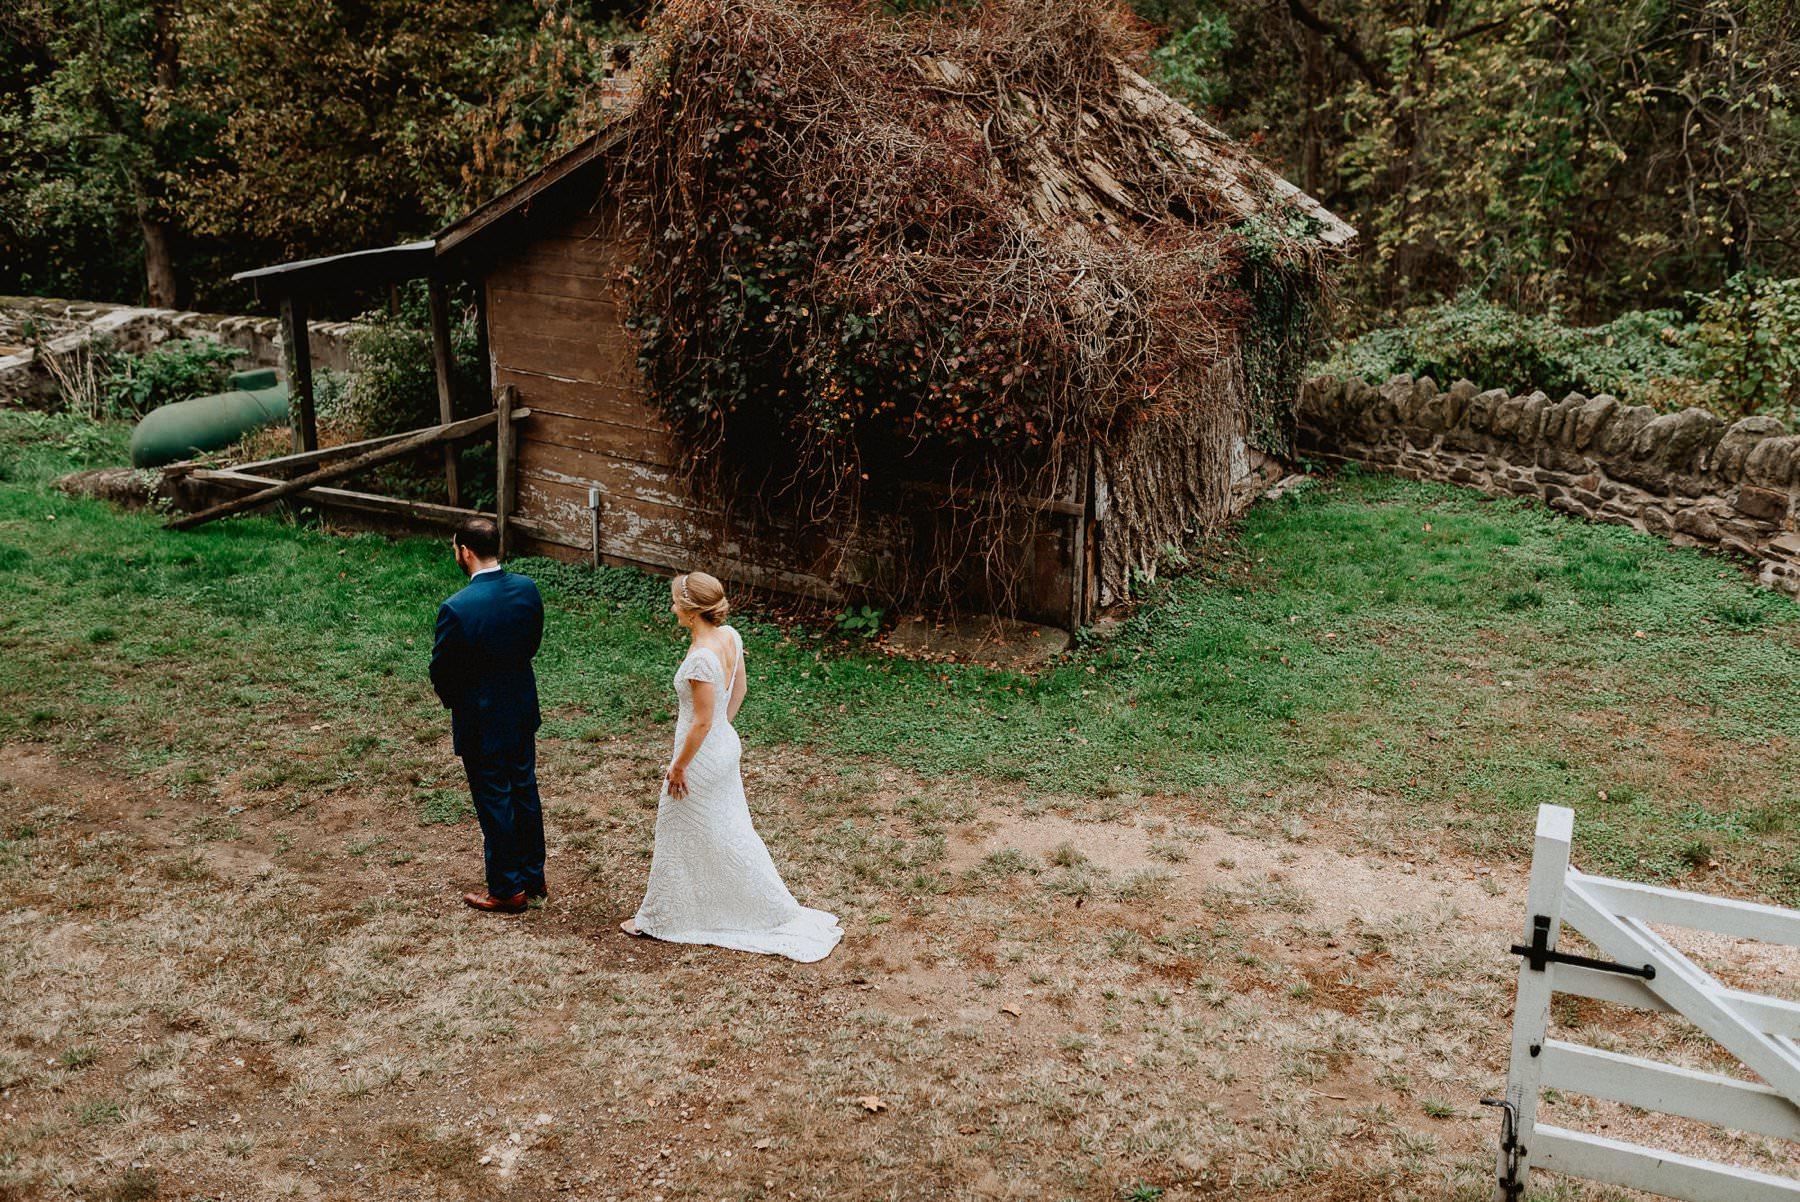 John_James_Audubon_Center_wedding-7.jpg